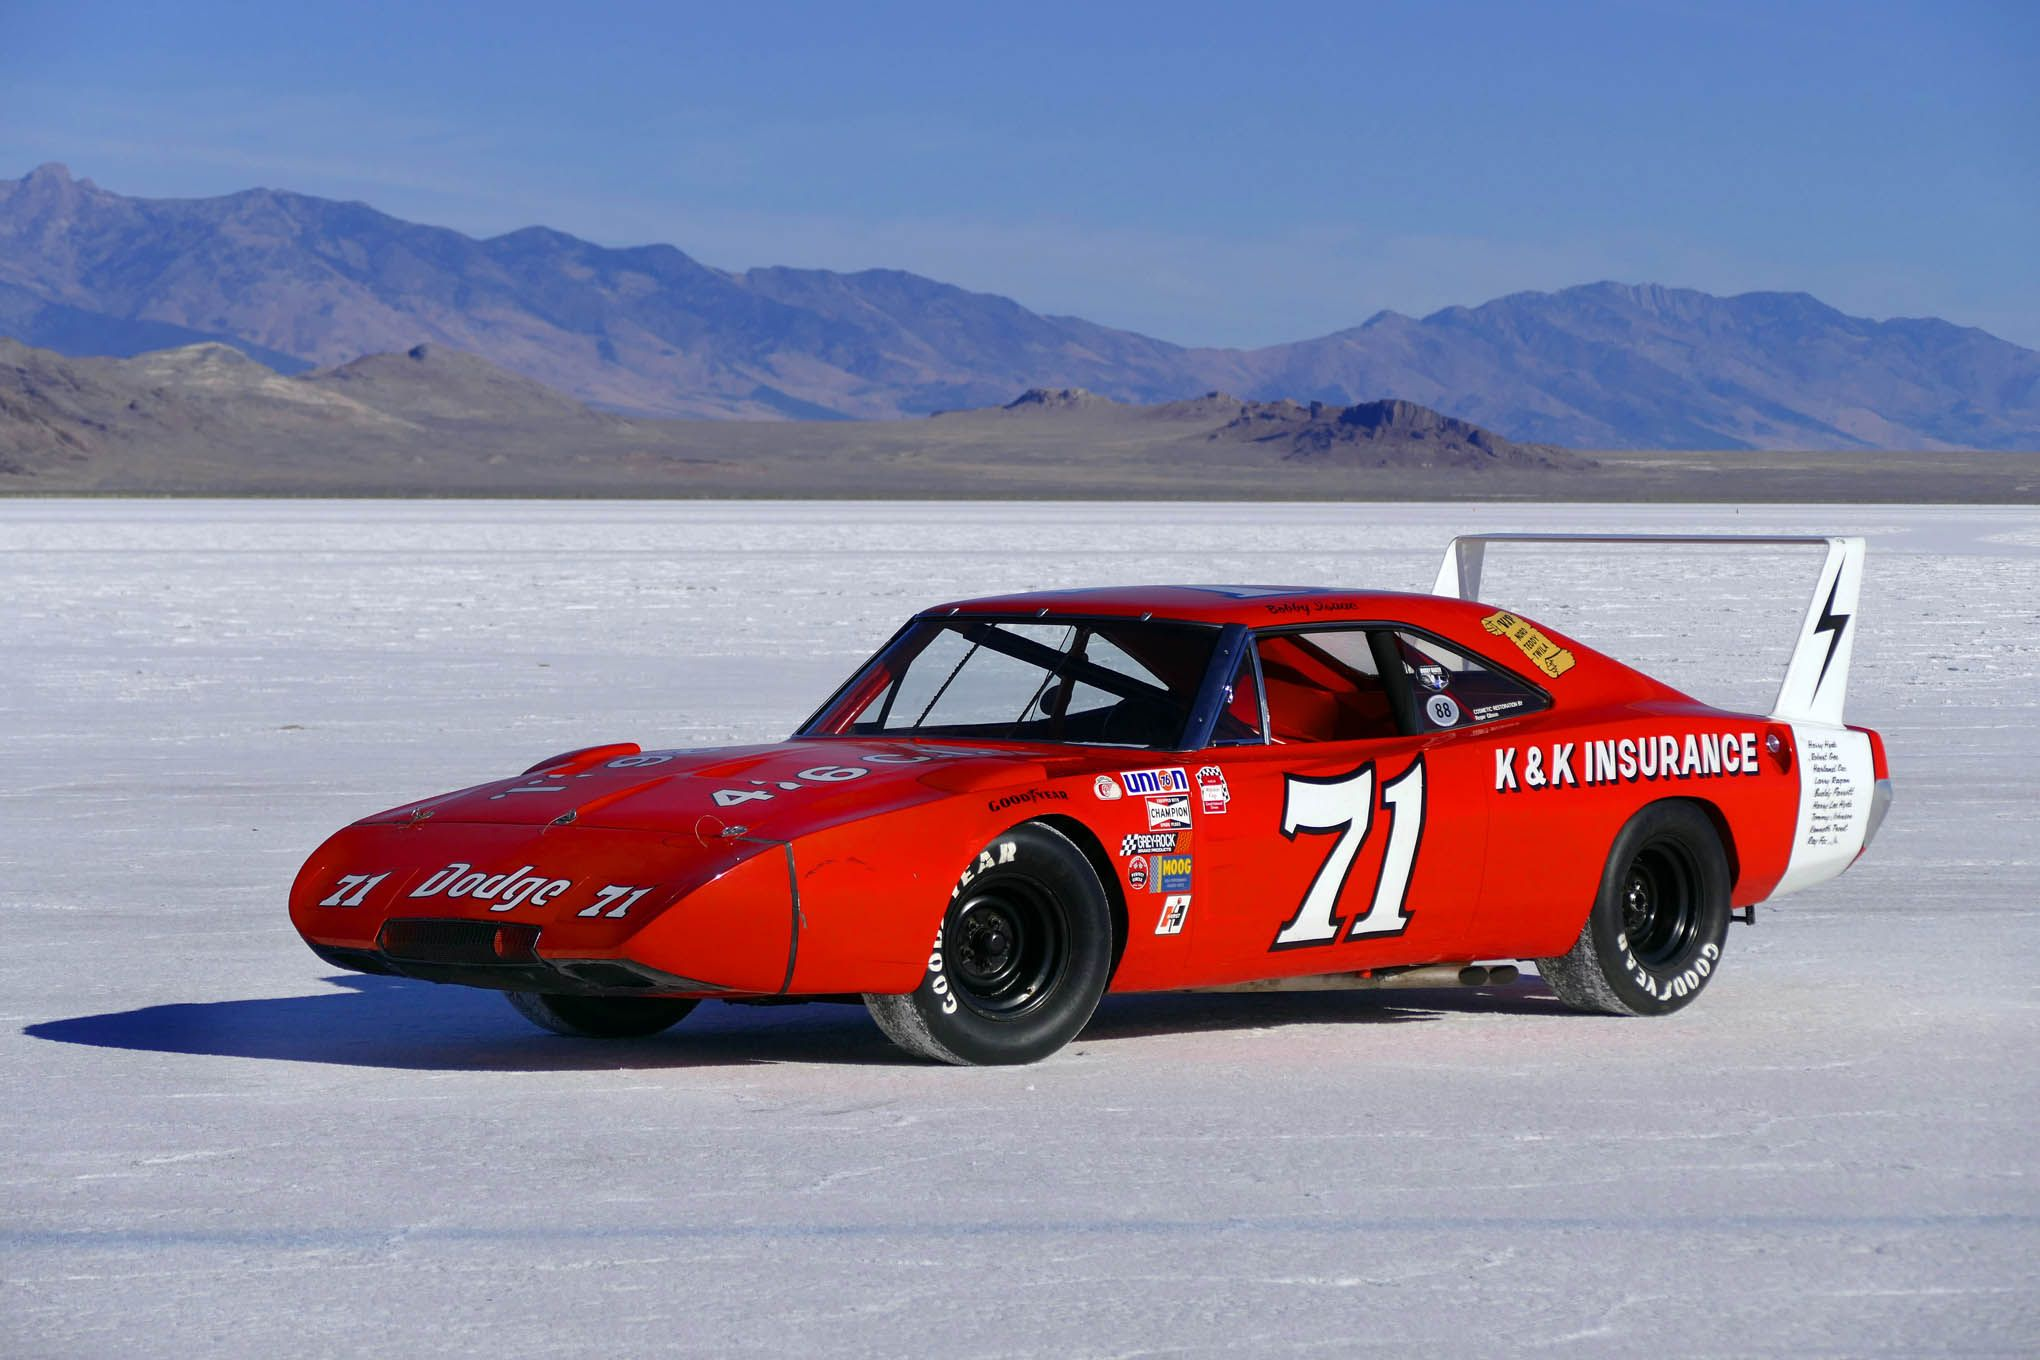 Dodge Daytona 1969 Nascar 01 Race Muscle cars Pinterest